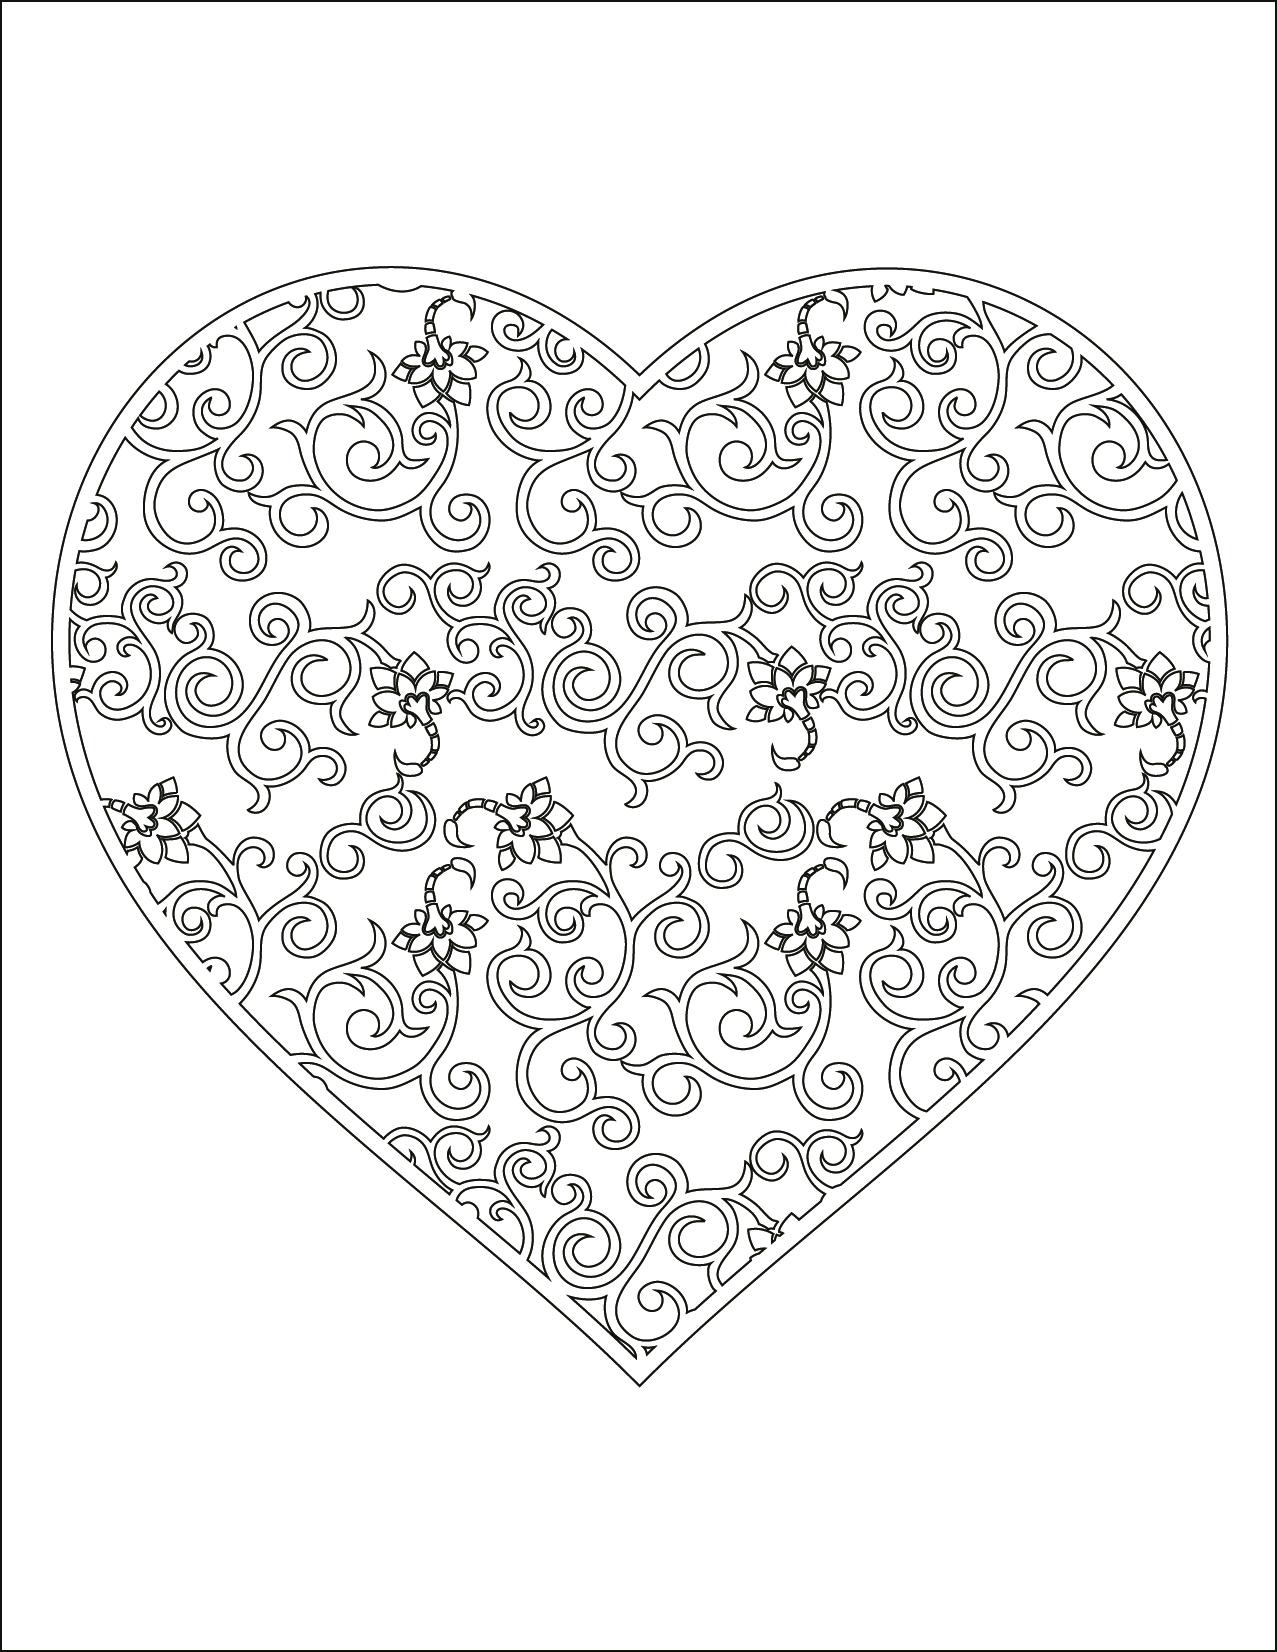 Coloriage à imprimer gratuit, coeur doodle - Artherapie.ca